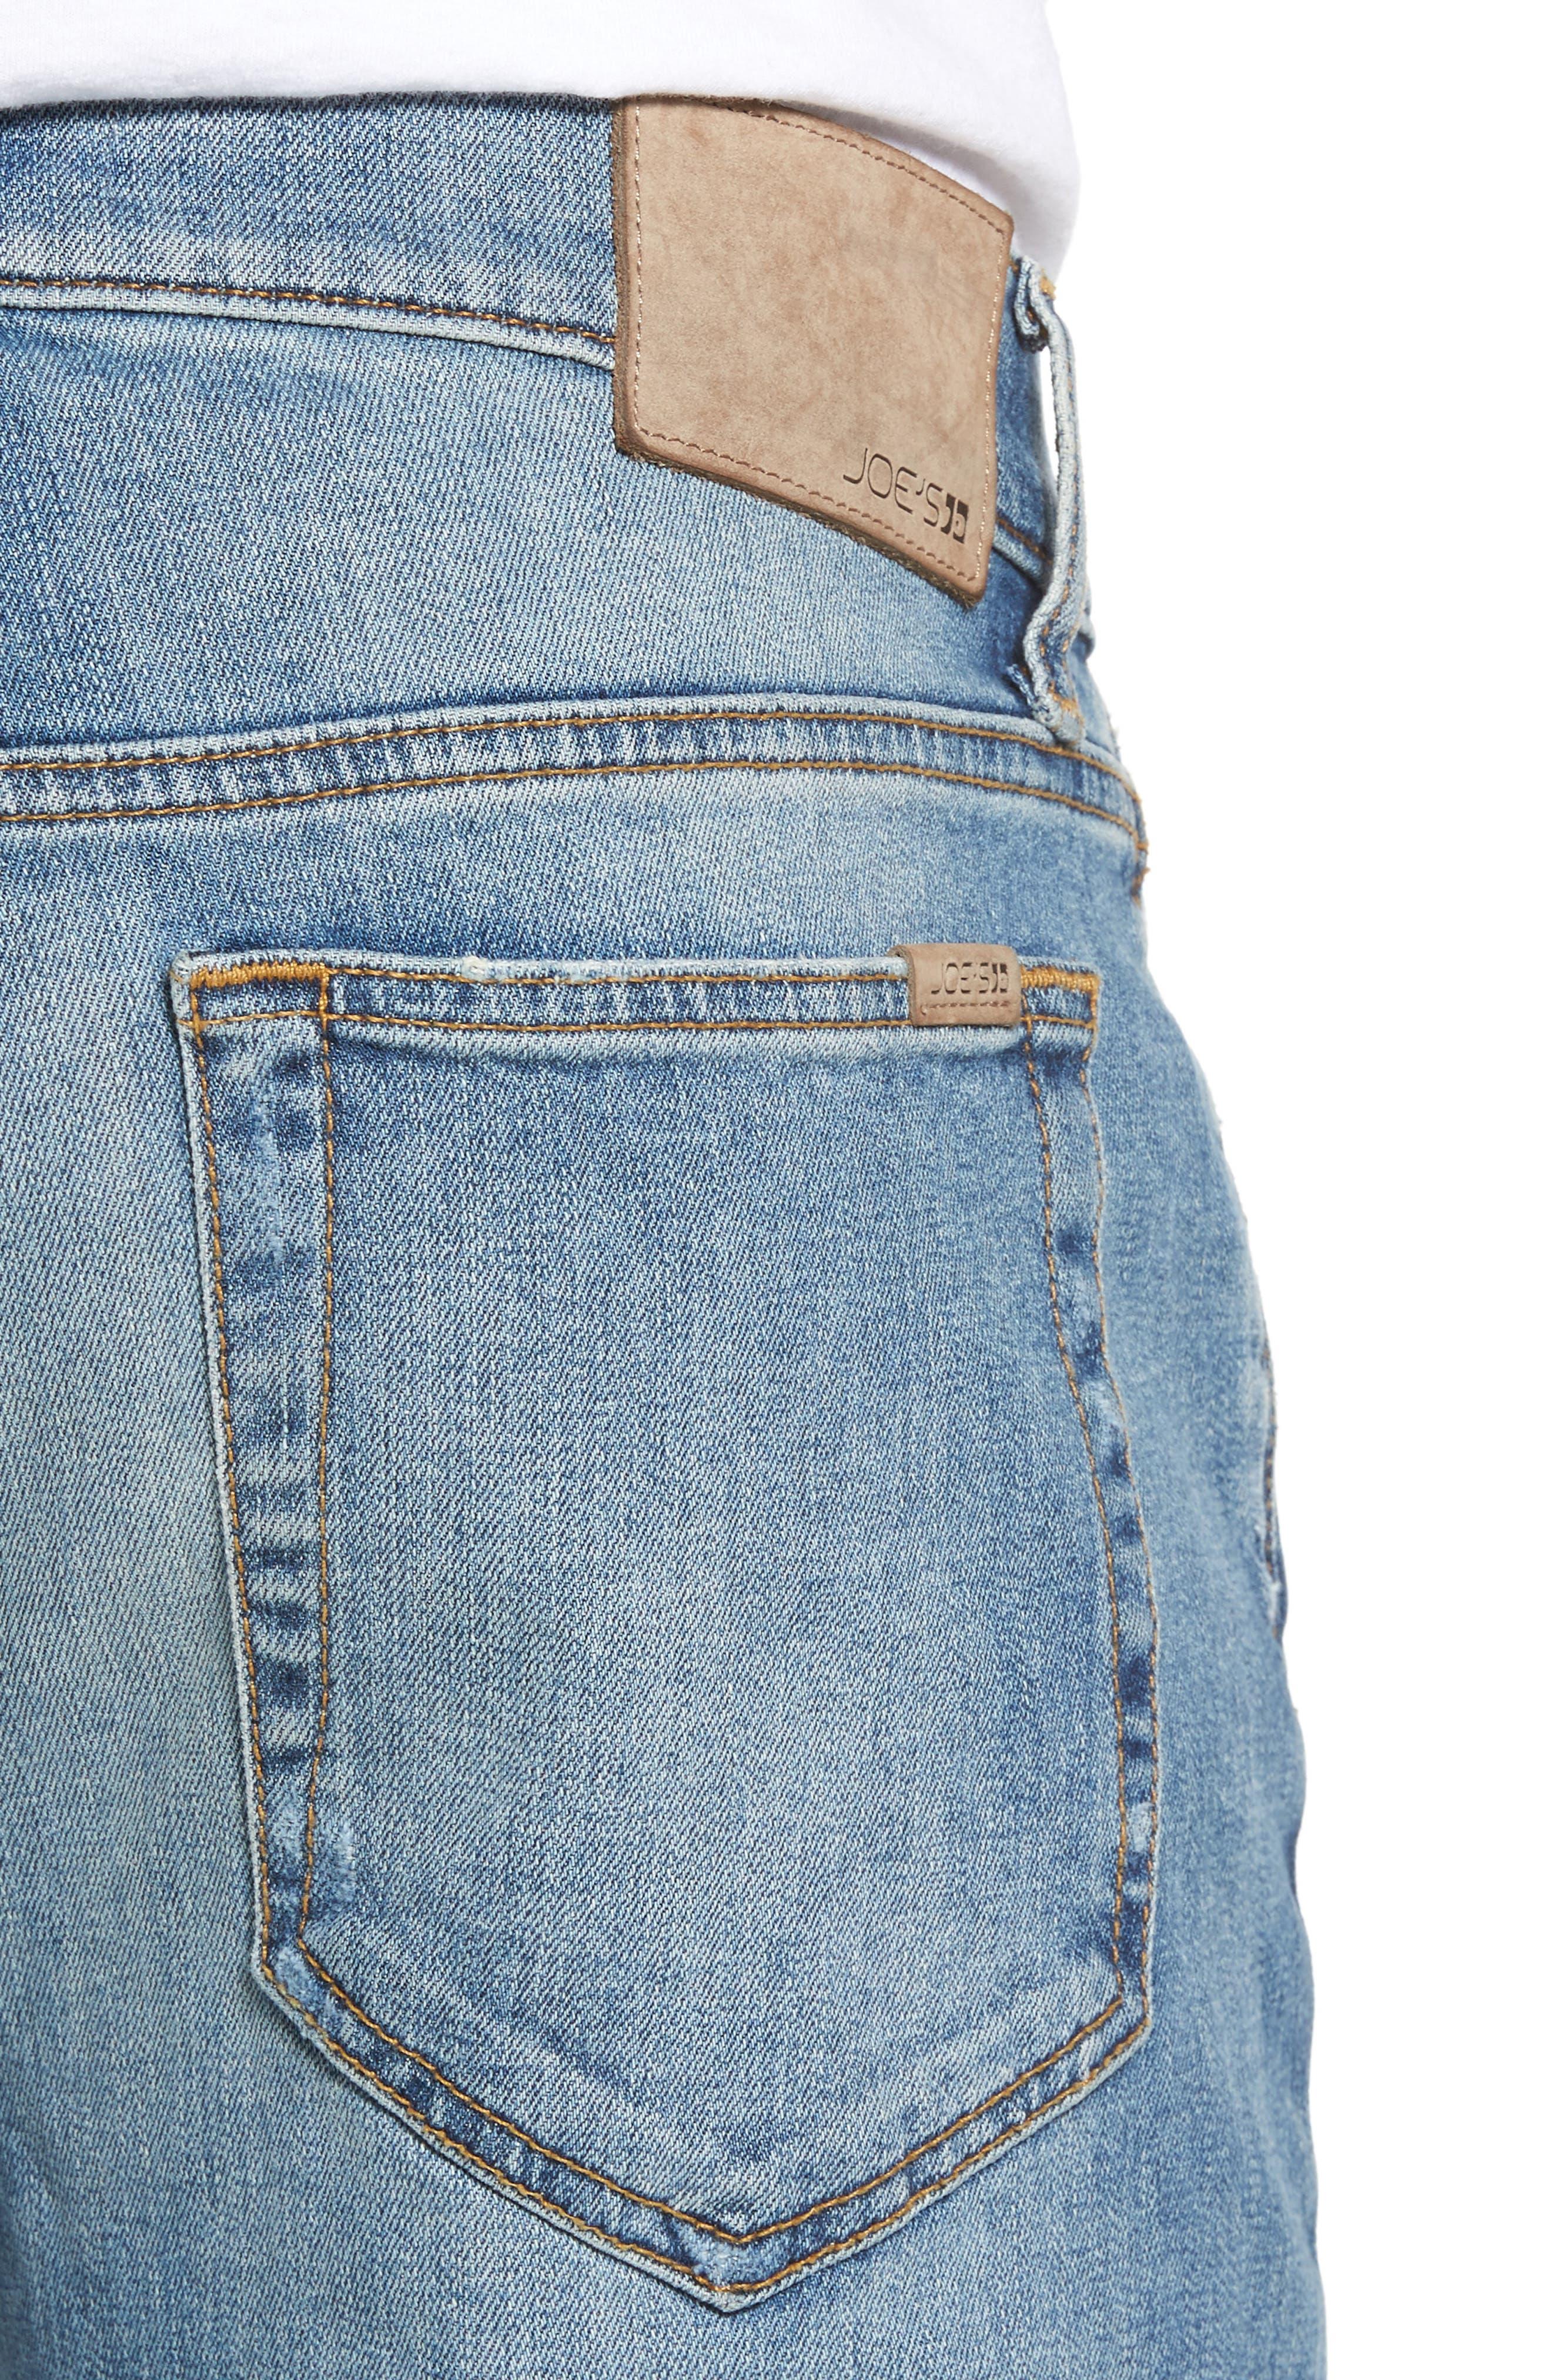 Brixton Slim Straight Fit Jeans,                             Alternate thumbnail 4, color,                             475